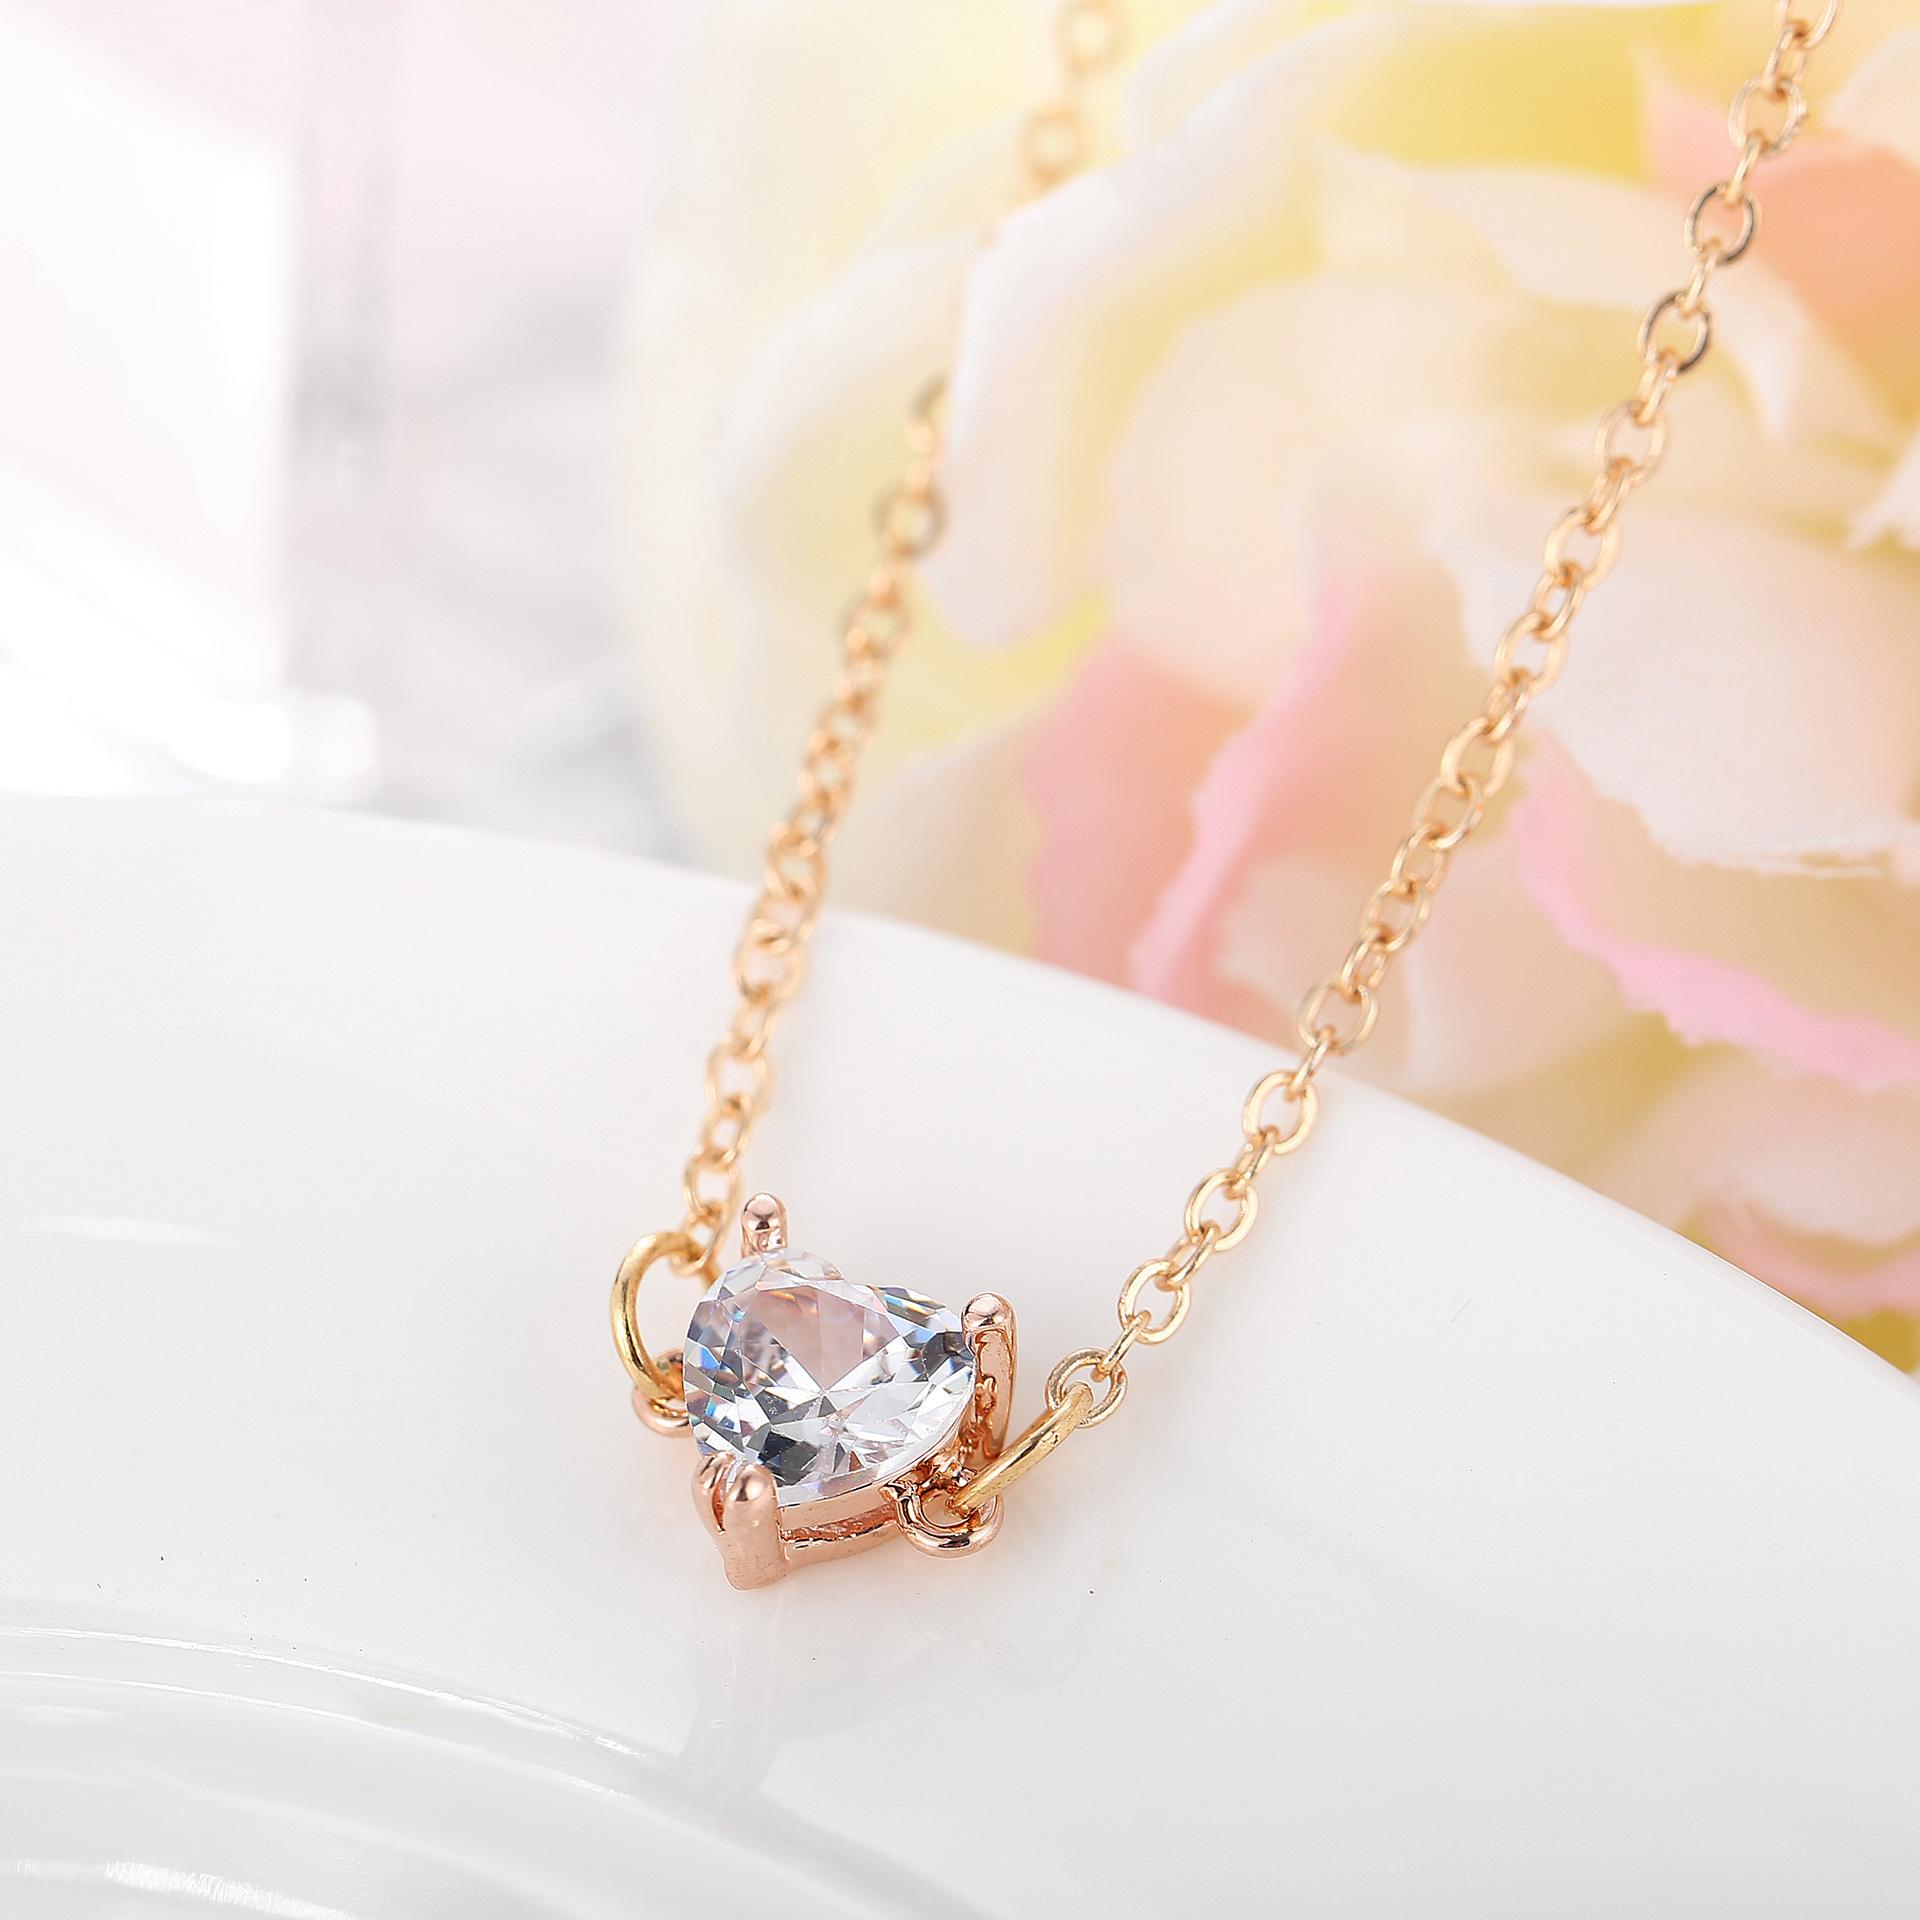 Alloy Fashion Geometric necklace  Real Platinum GDY0306 NHPJ0149RealPlatinumGDY0306